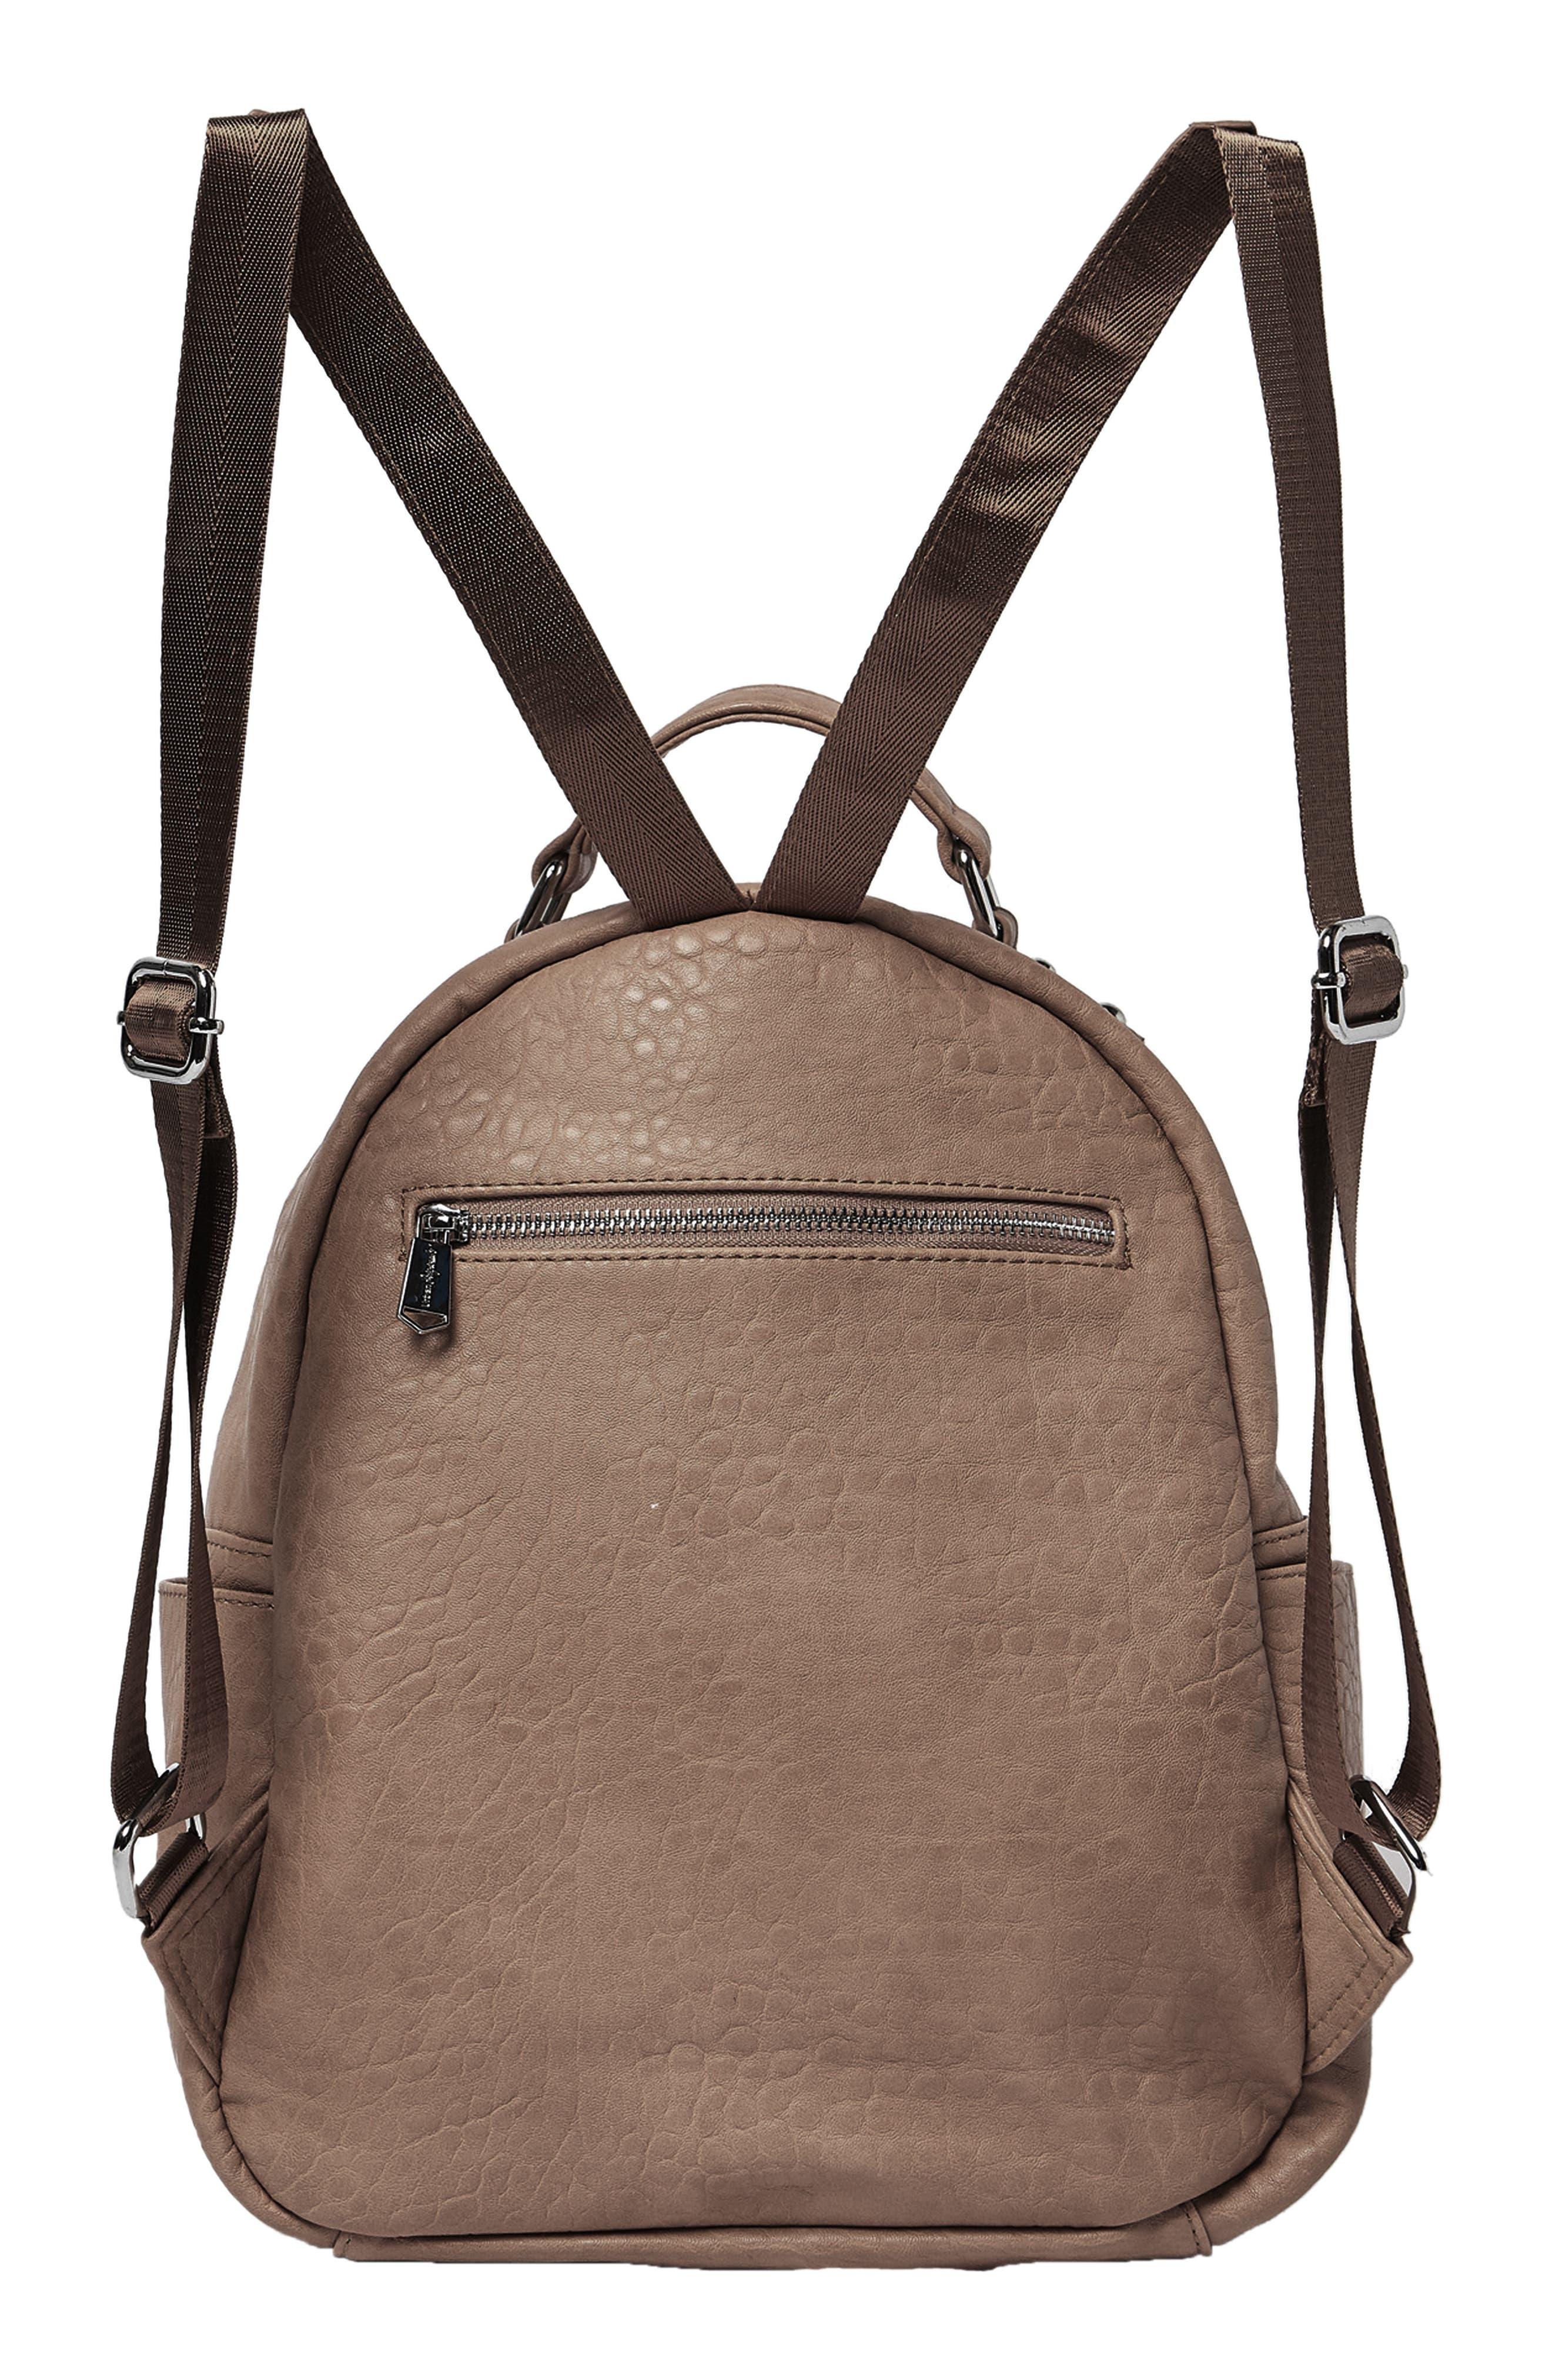 South Bag Vegan Leather Backpack,                             Alternate thumbnail 2, color,                             MOCHA